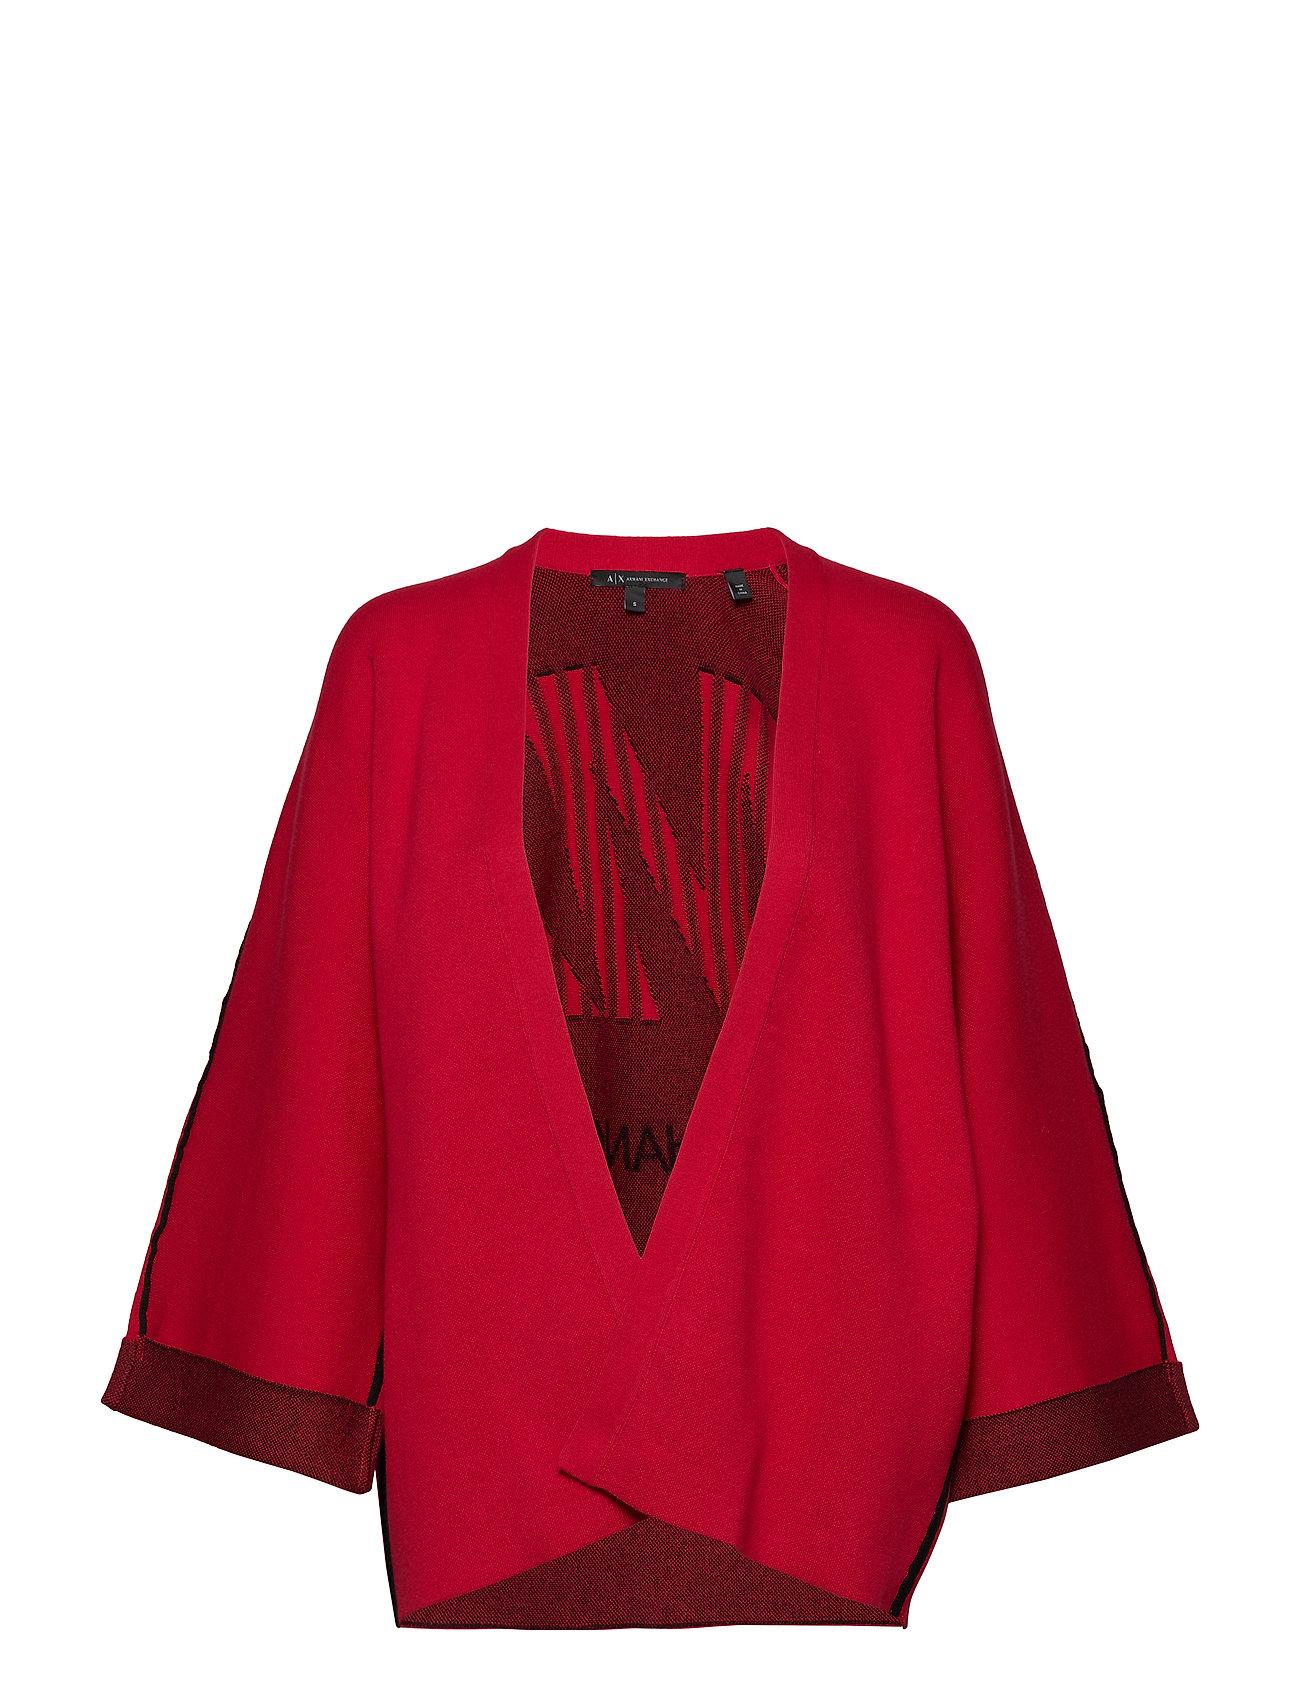 Armani Exchange WOMAN KNITWEAR CARDIGAN - RED SHOES /BLACK